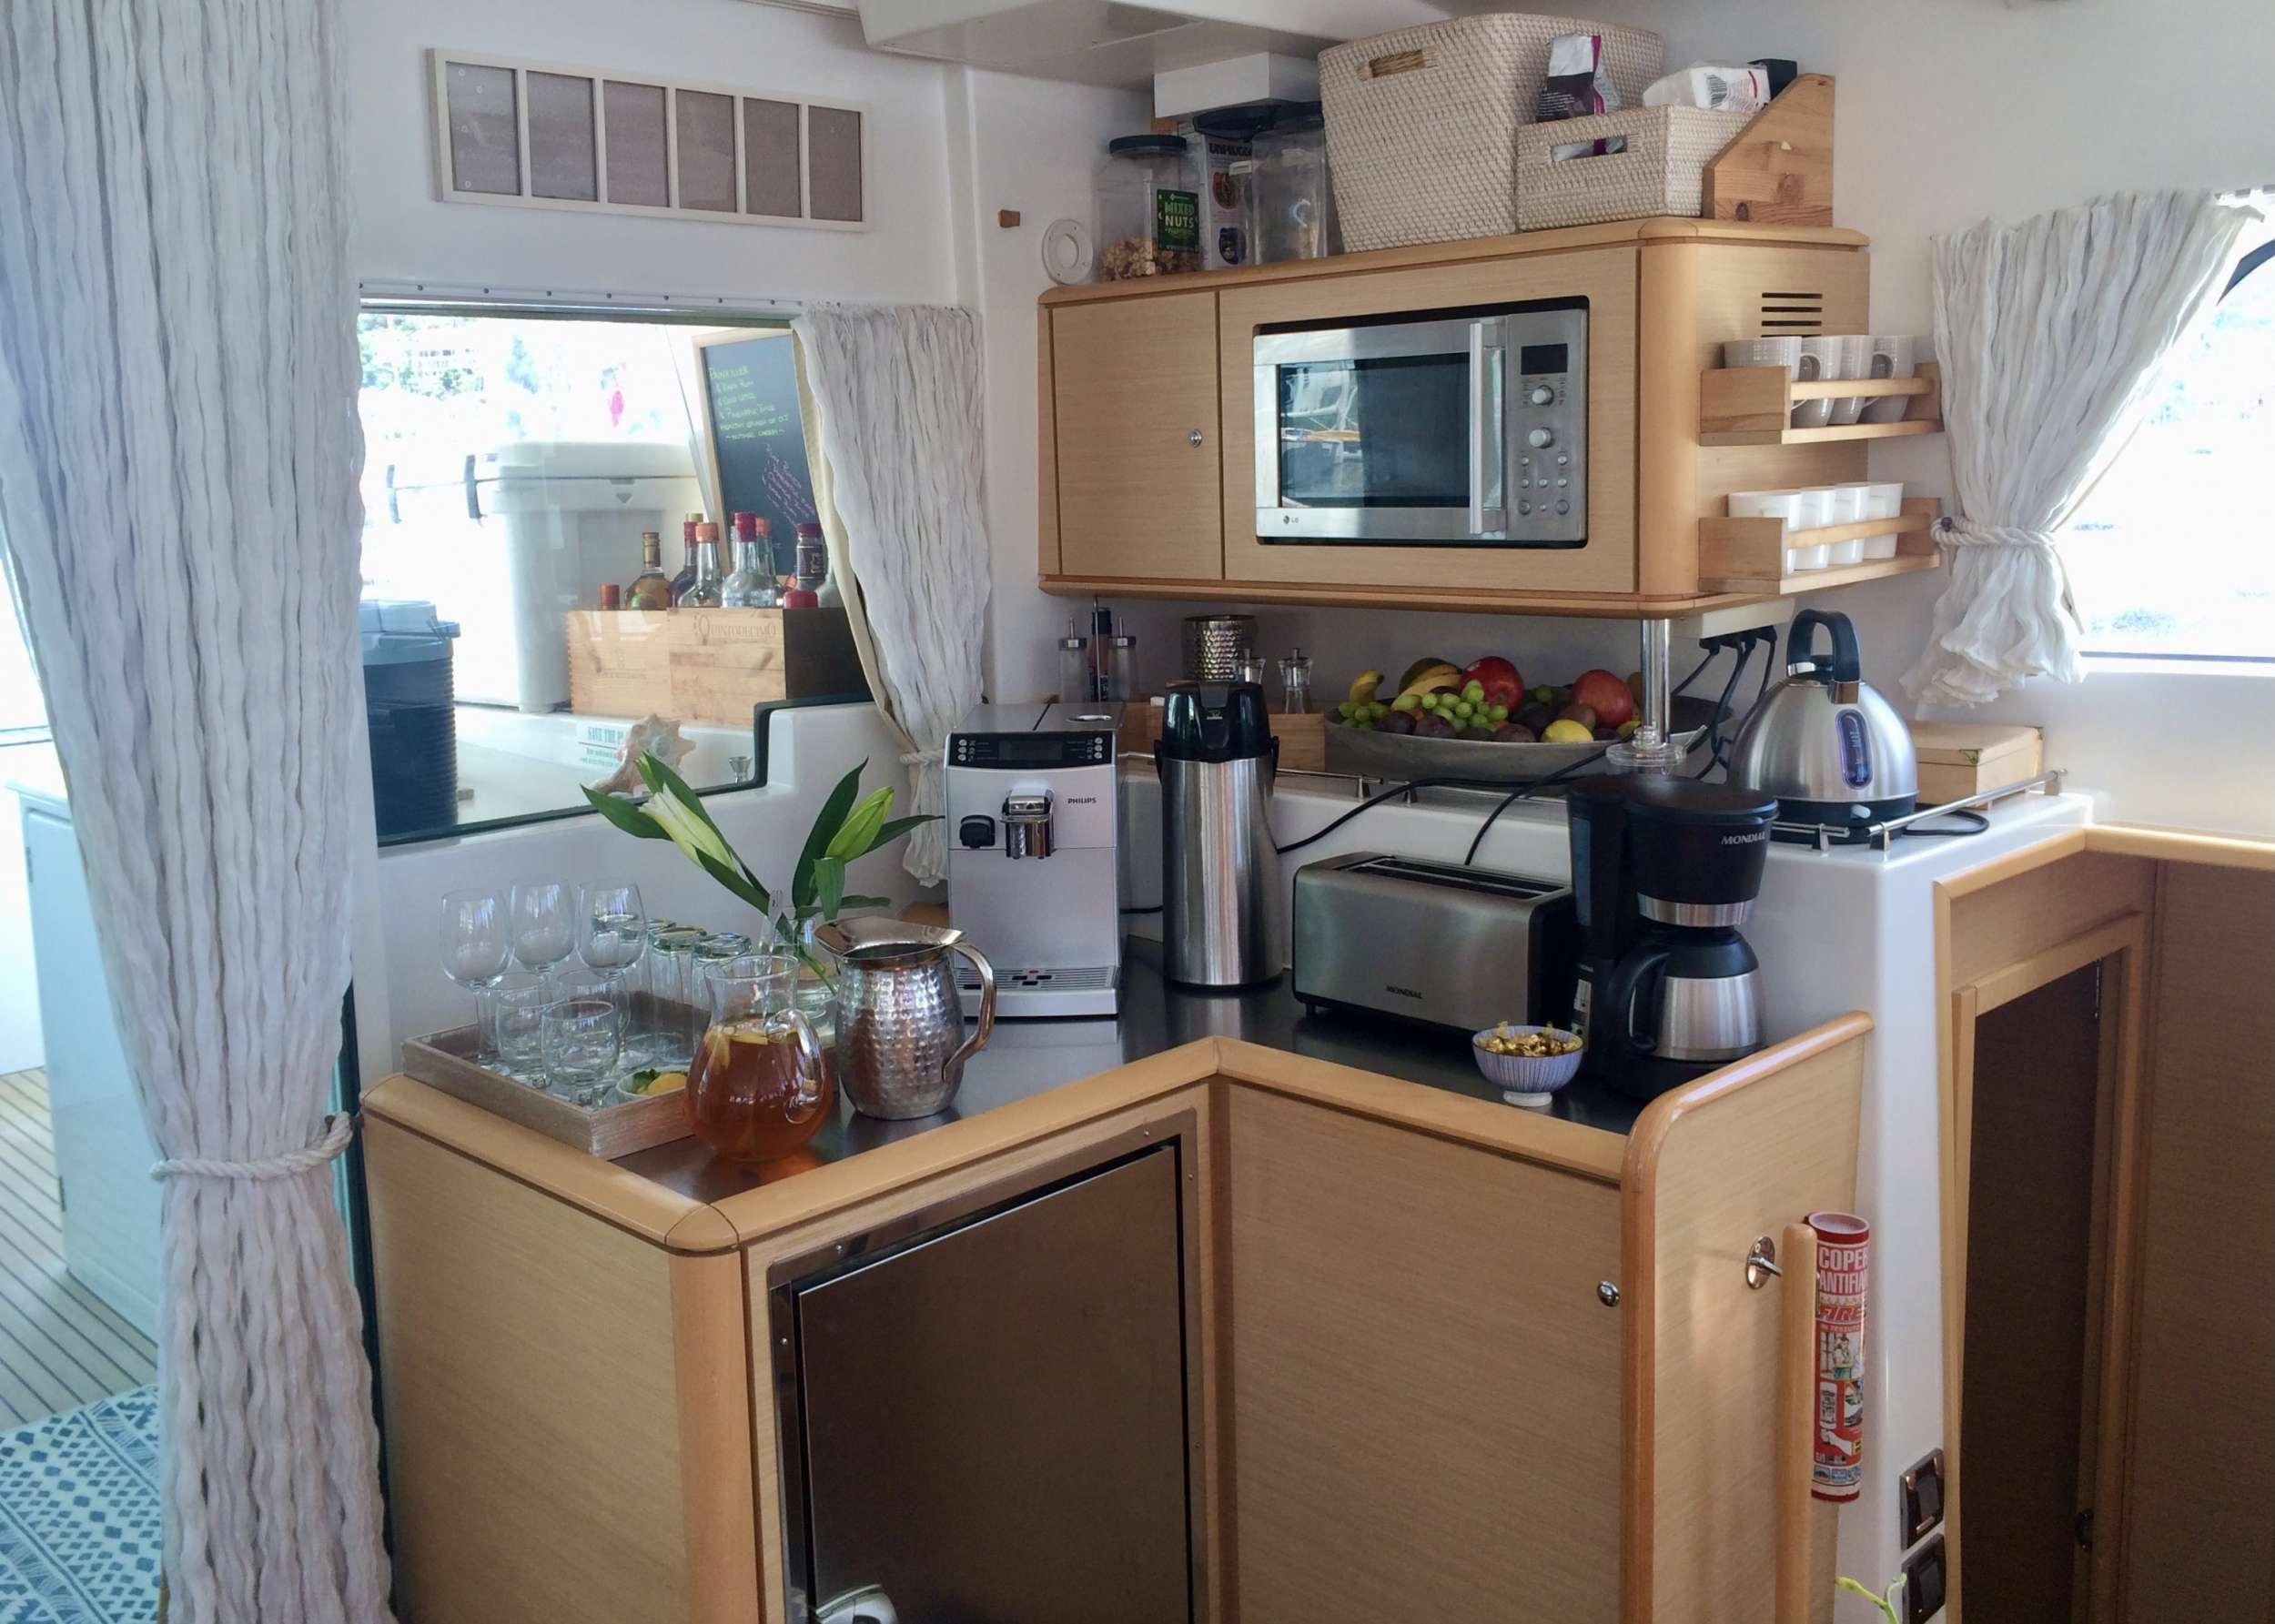 Coffee bar with modern coffee machine, and help yourself snack bar